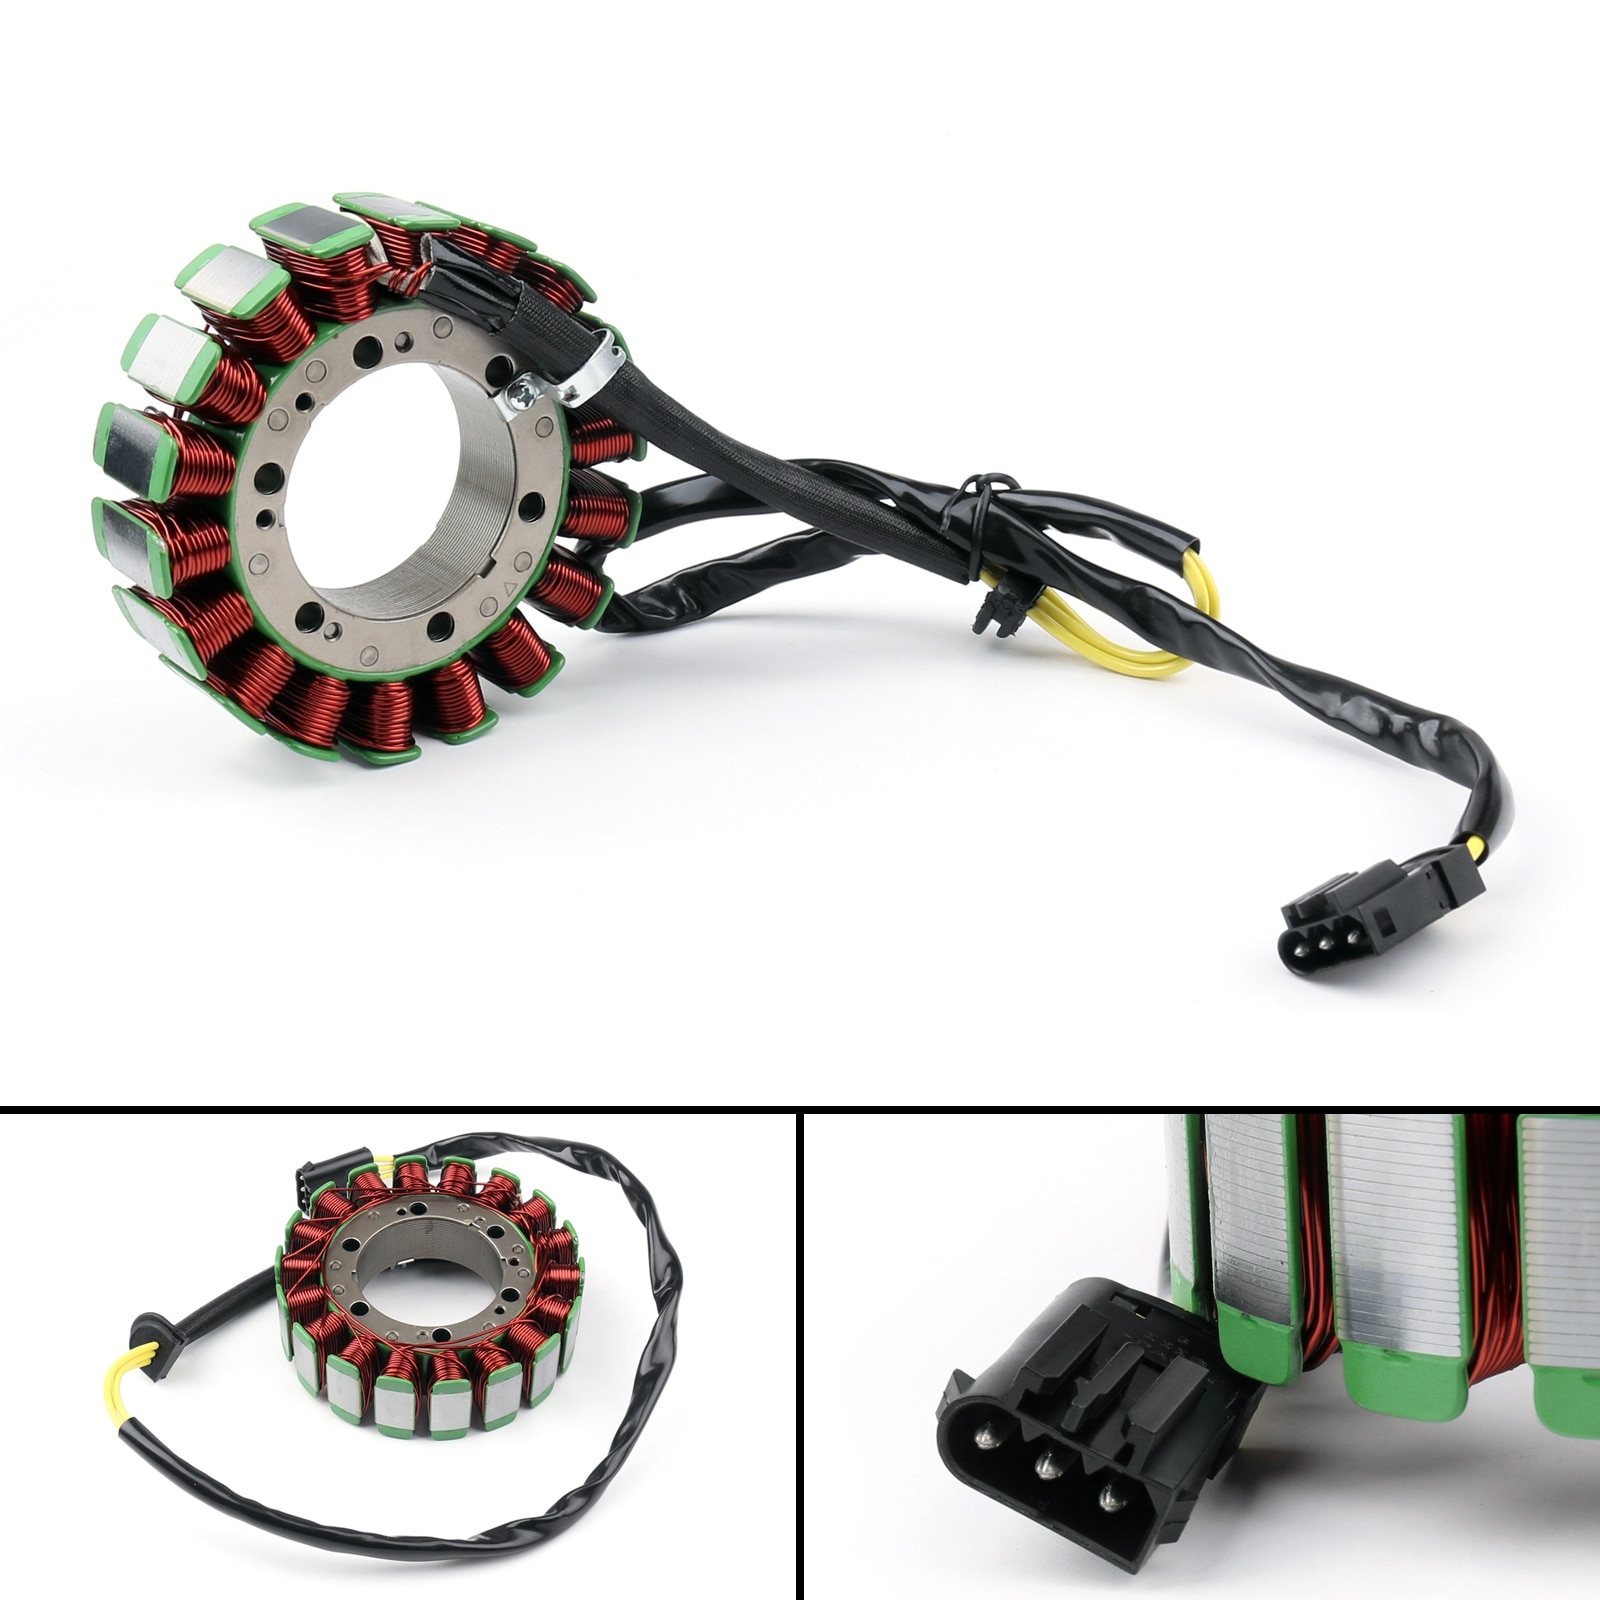 Artudatech катушки статора генератора магнето для BMW F650GS 2009-2014 F700GS 2013-14 F 600 700 GS 600GS 700GS 800 S R GT запчасти